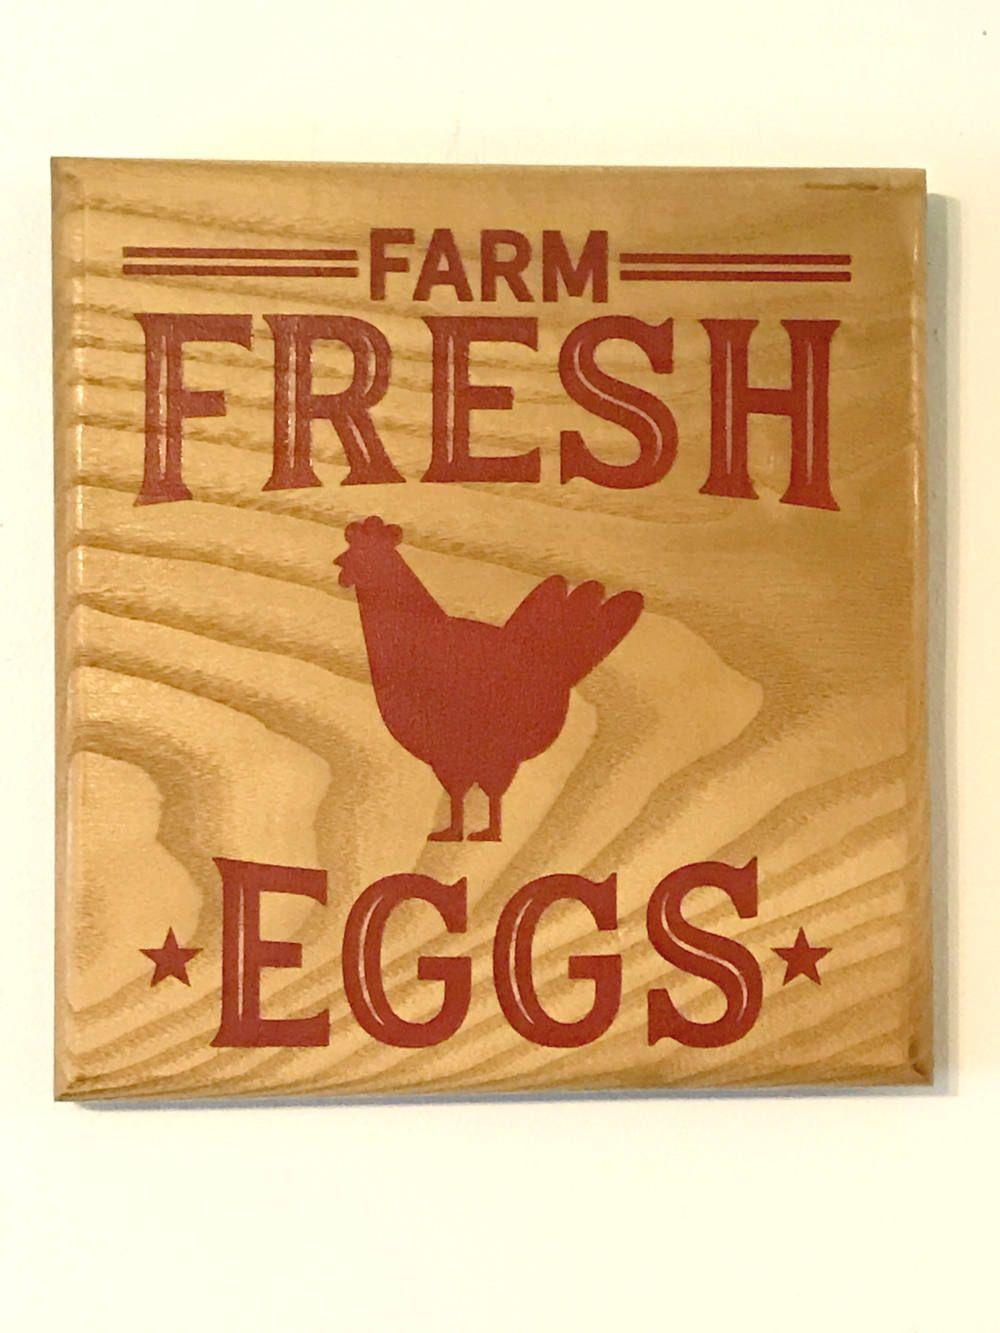 Country home decor Chicken decor chicken sign fresh eggs sign